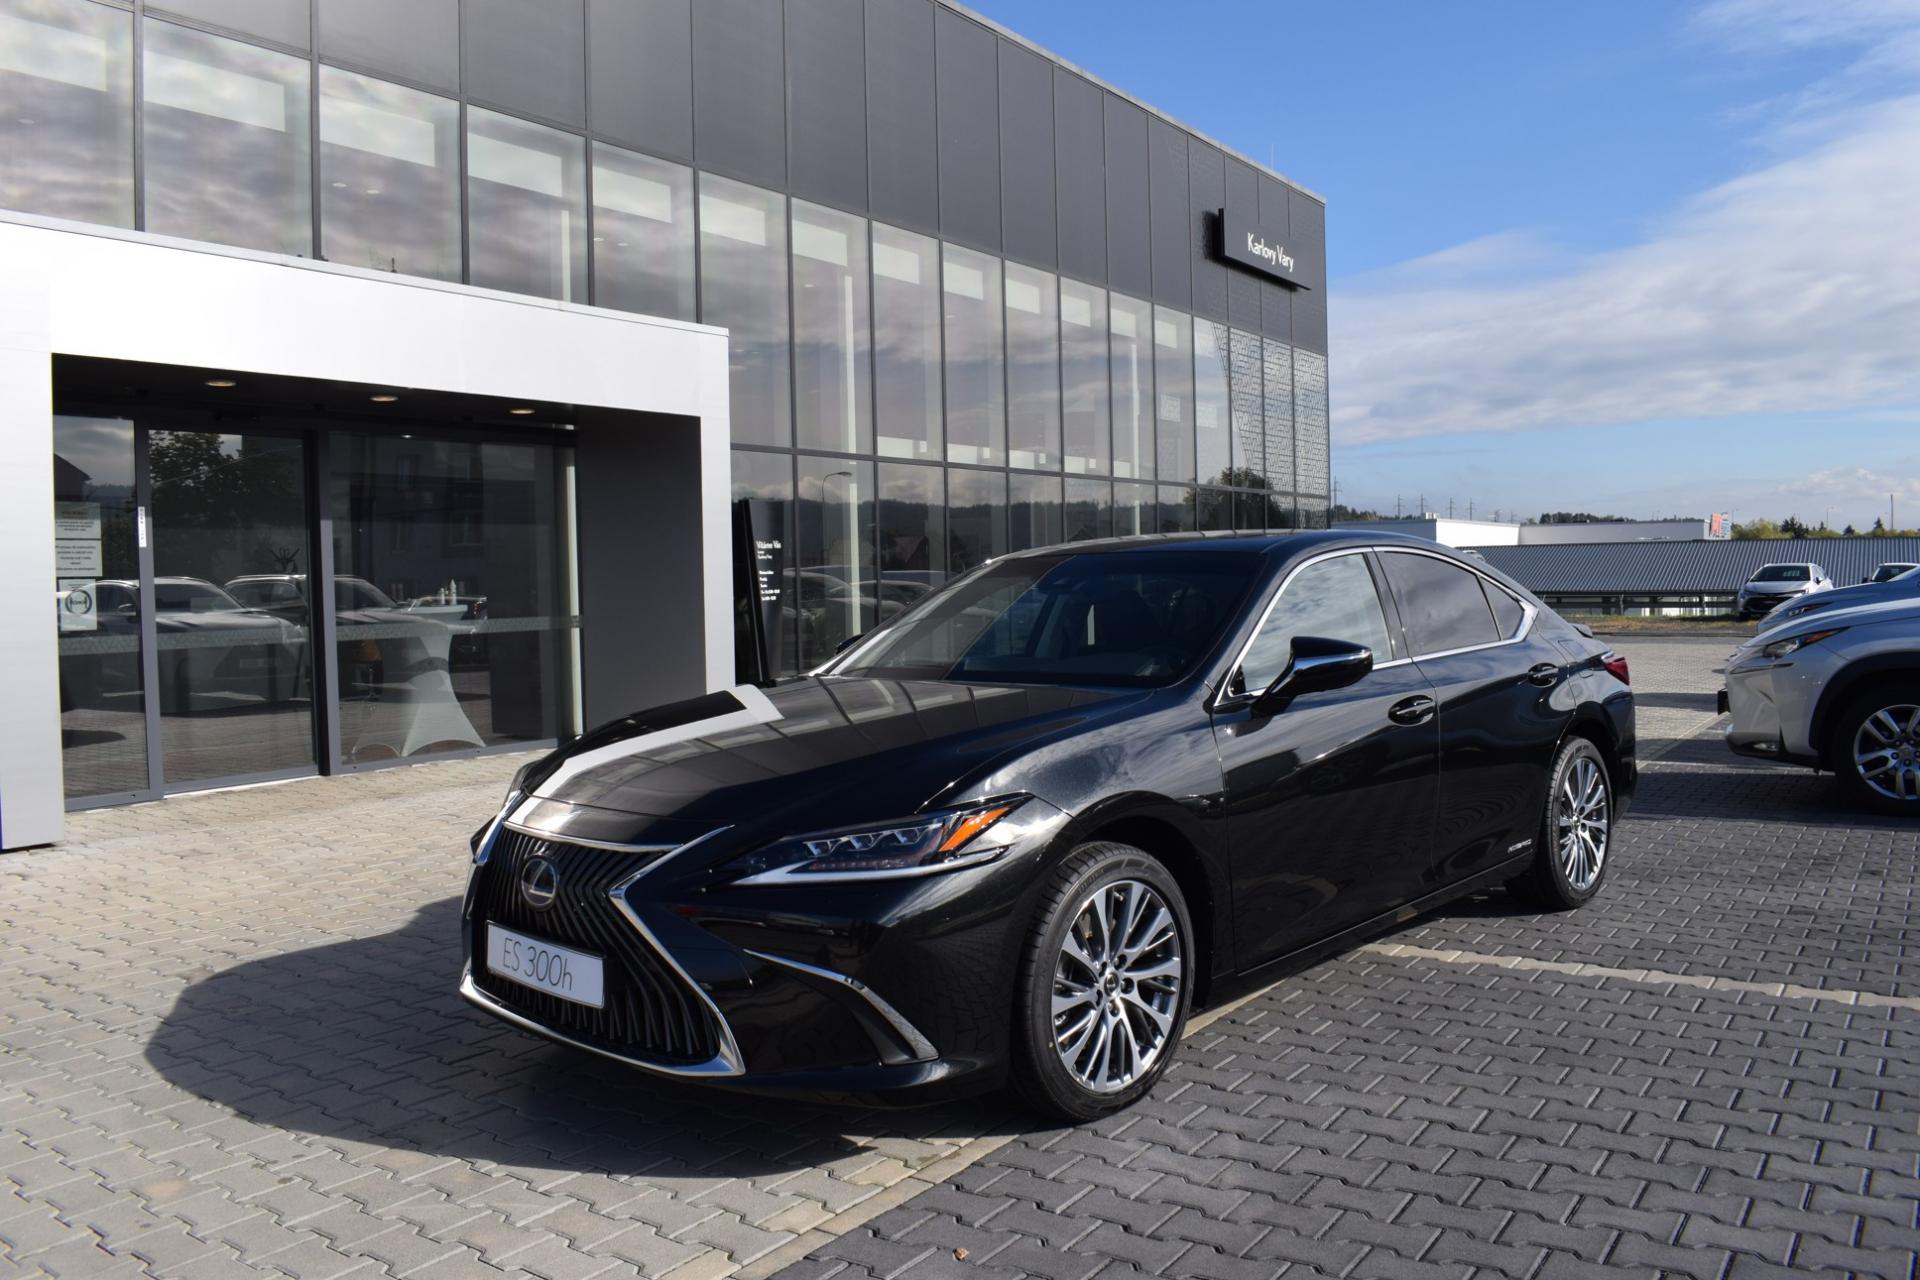 Lexus ES 300h PRESTIGE TOP 2.5 L Petrol Hybrid (218 k) aut. e-CVT